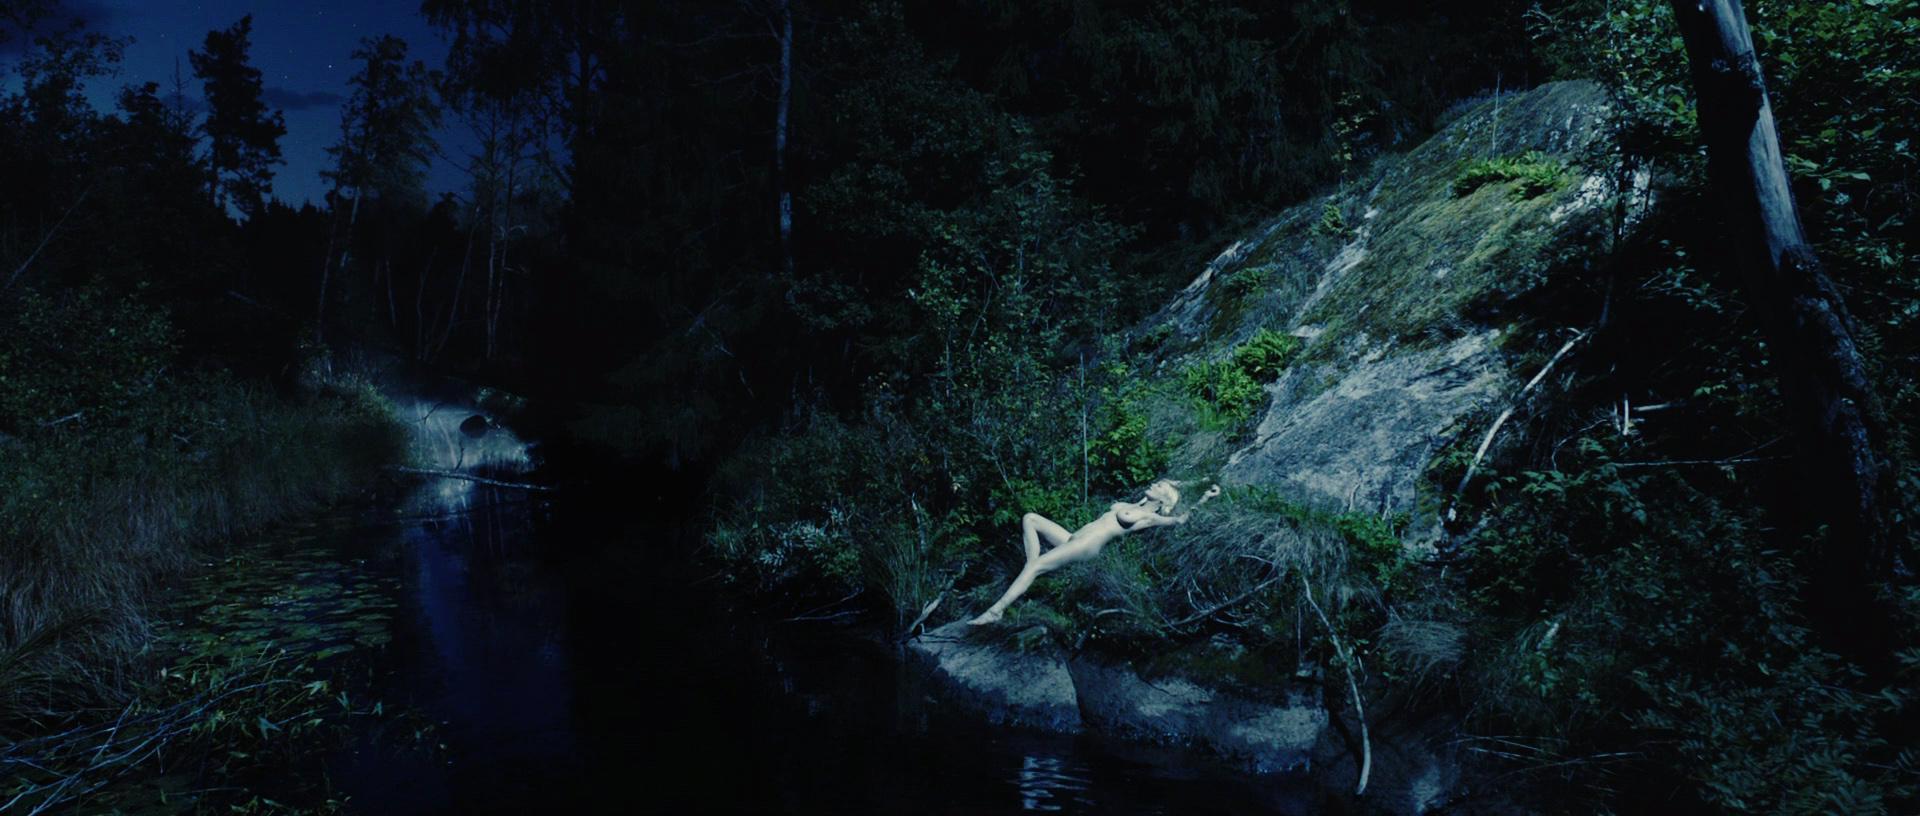 Kirsten Dunst imagenes desnuda